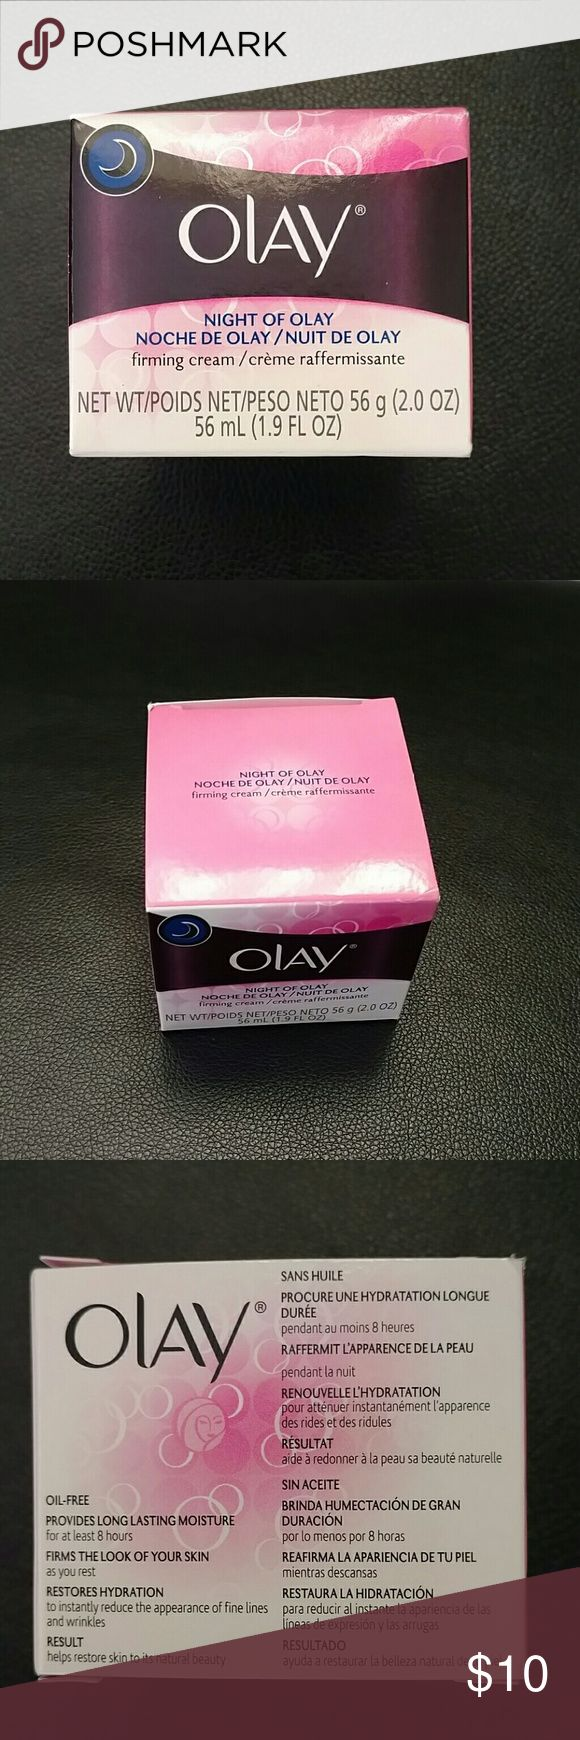 Olay firming cream Night of Pray. Firming cream. 2.00oz 1.9floz 56ml olay Makeup Face Primer